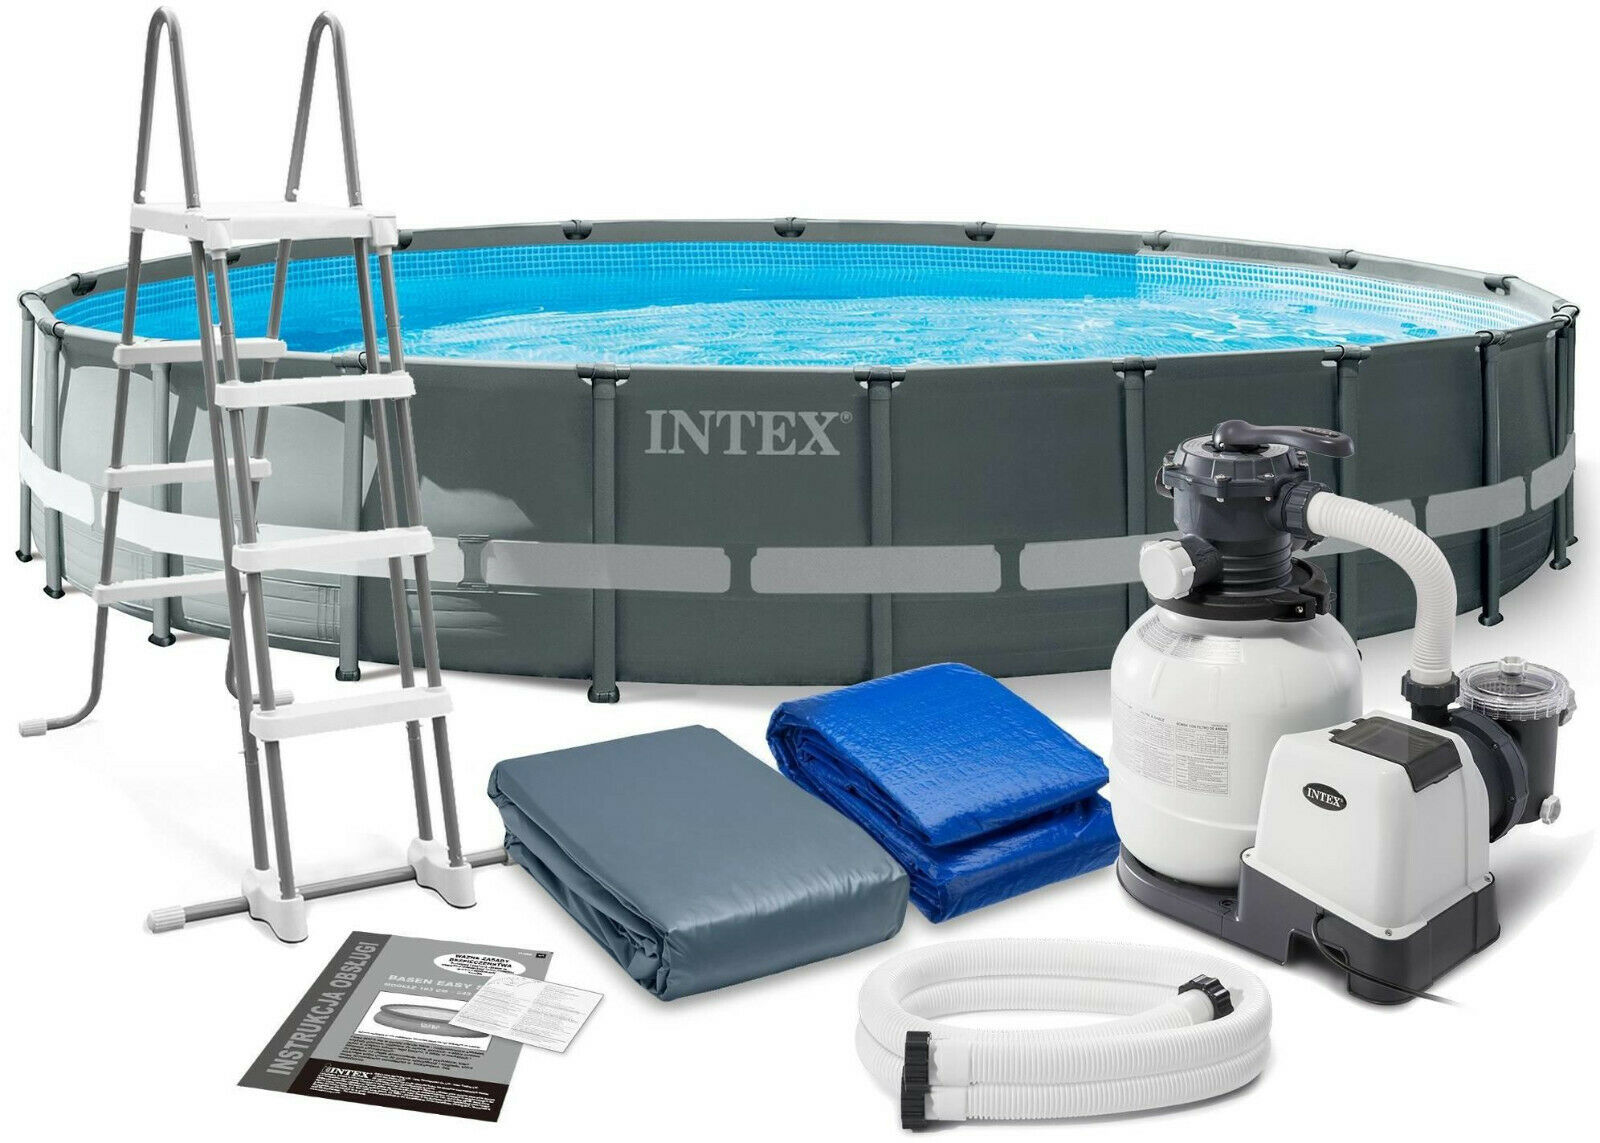 Intex 26334 610 x 122cm Round Above Ground Pool Ultra Xtr Frame Sand Filter Pump